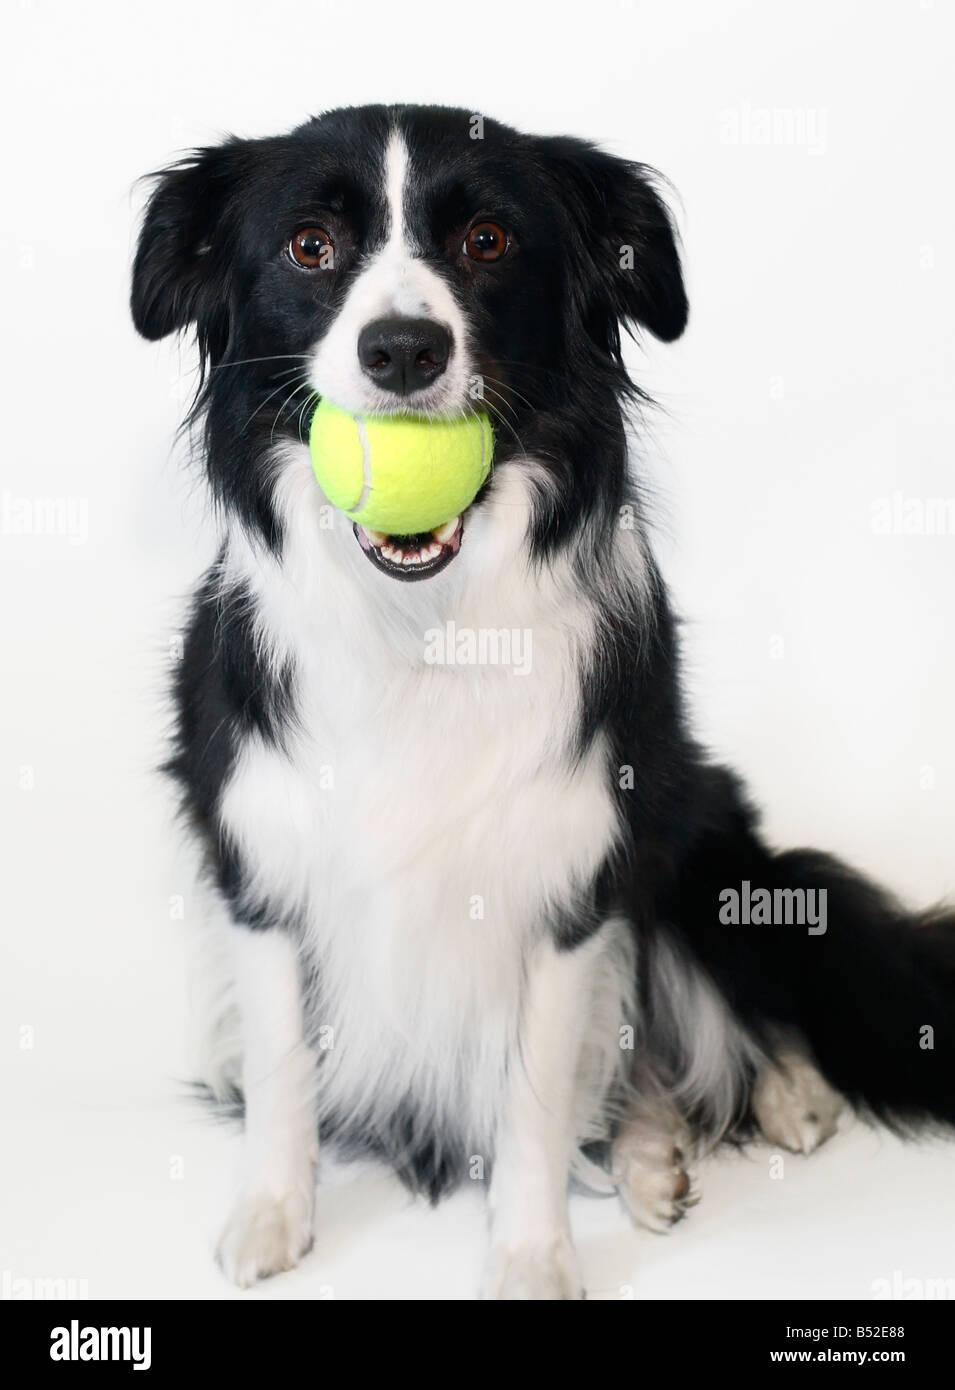 Border Collie Holding A Tennis Ball Stock Photo 20338760 Alamy